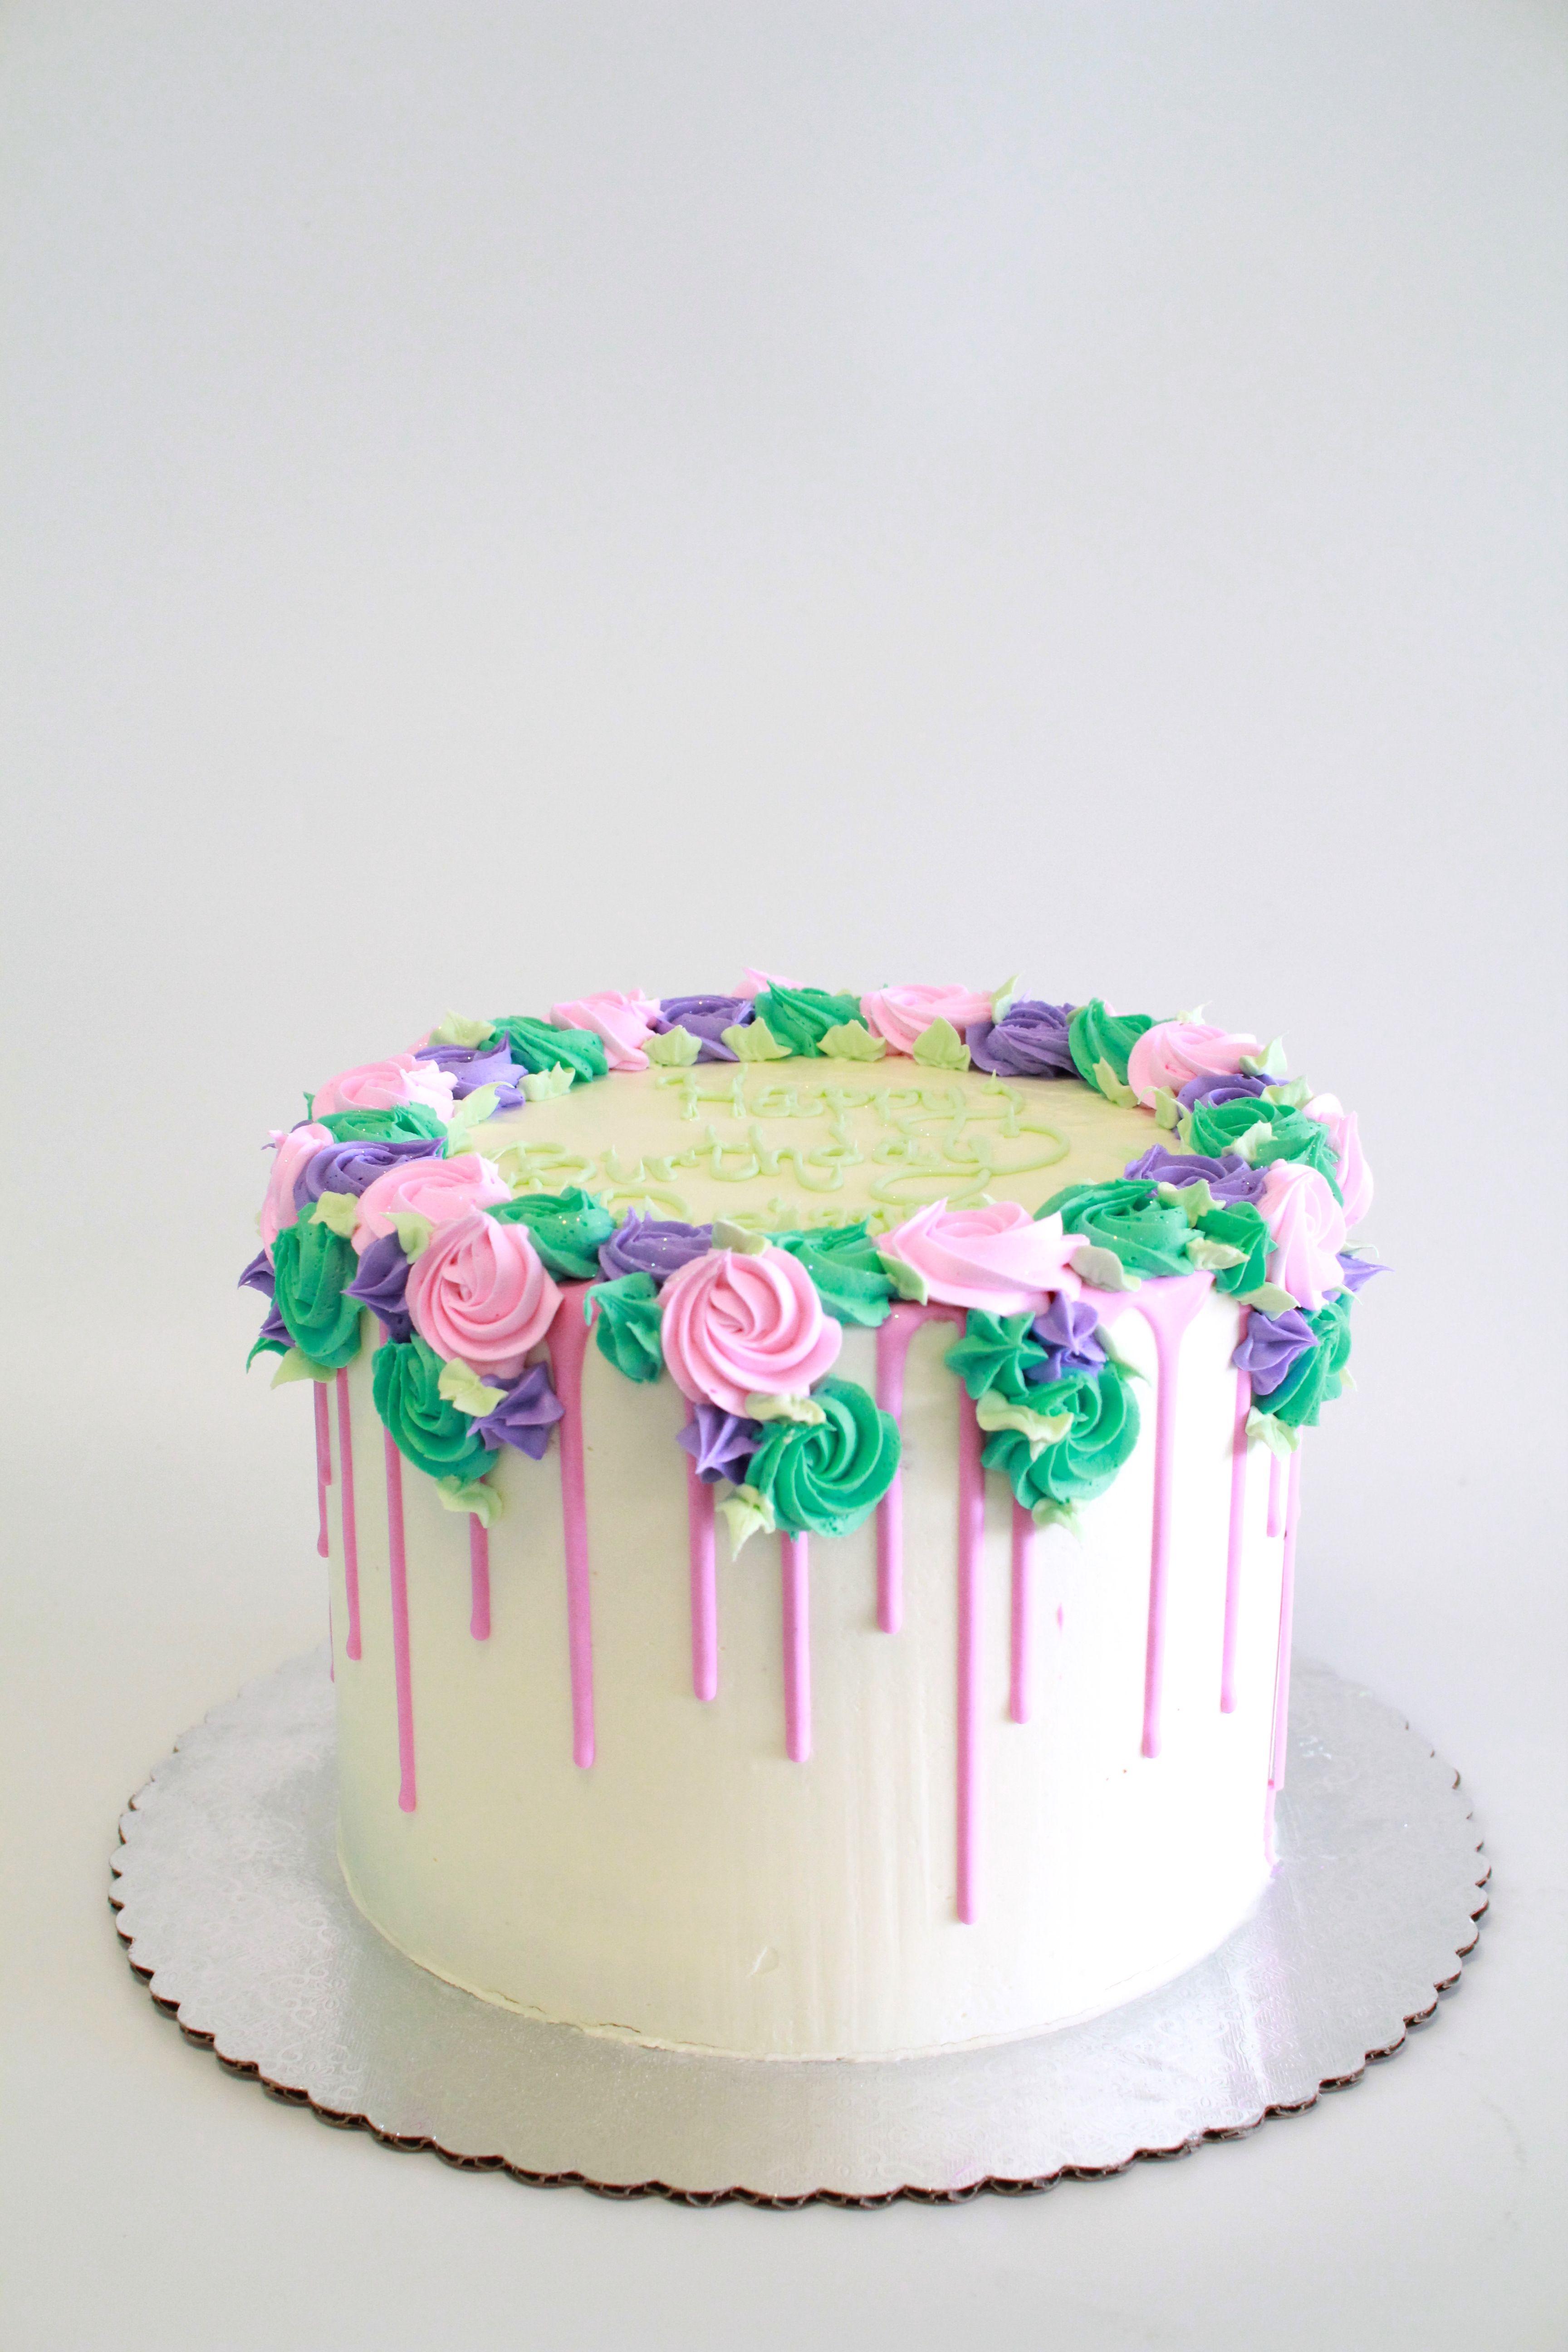 DRIP CAKE by Cake Bash Studio & Bakery, Lake Balboa CA